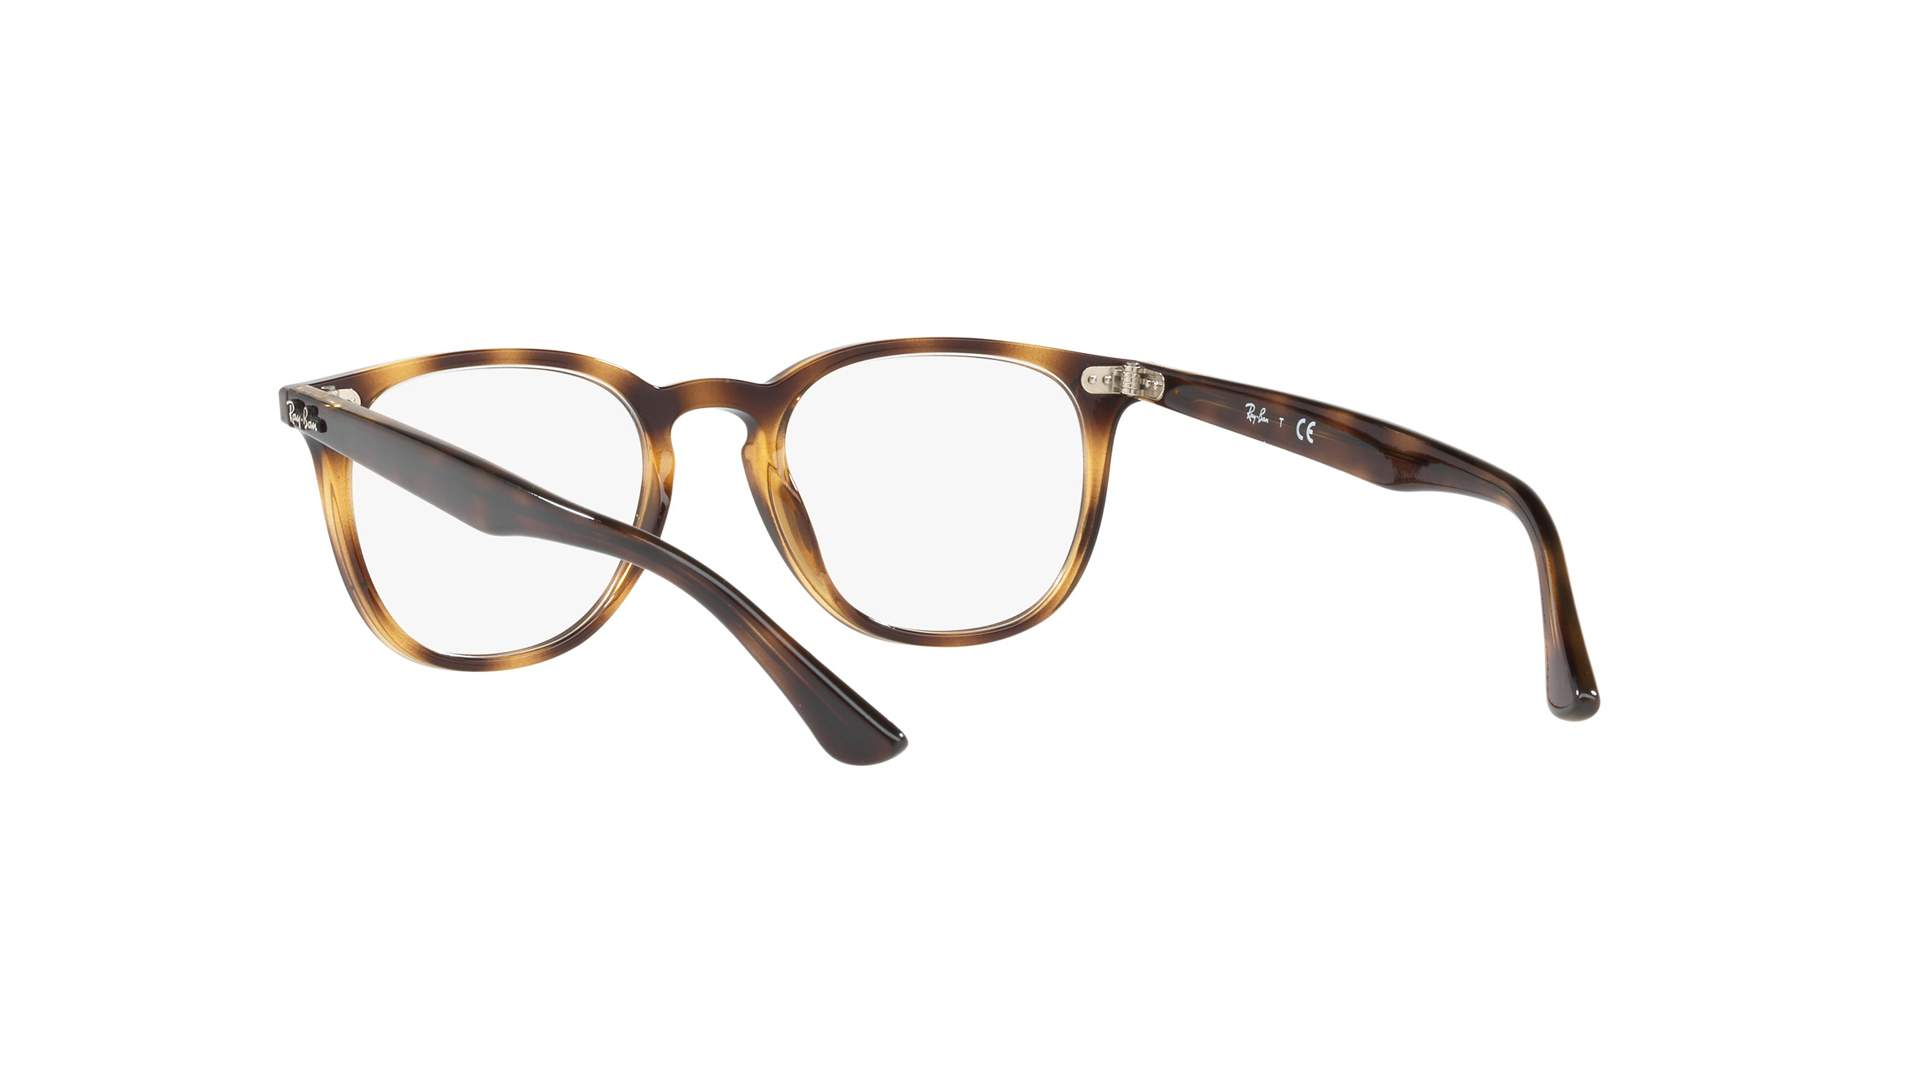 240b3855dd9 Eyeglasses Ray-Ban RX7159 RB7159 2012 50-20 Tortoise Medium